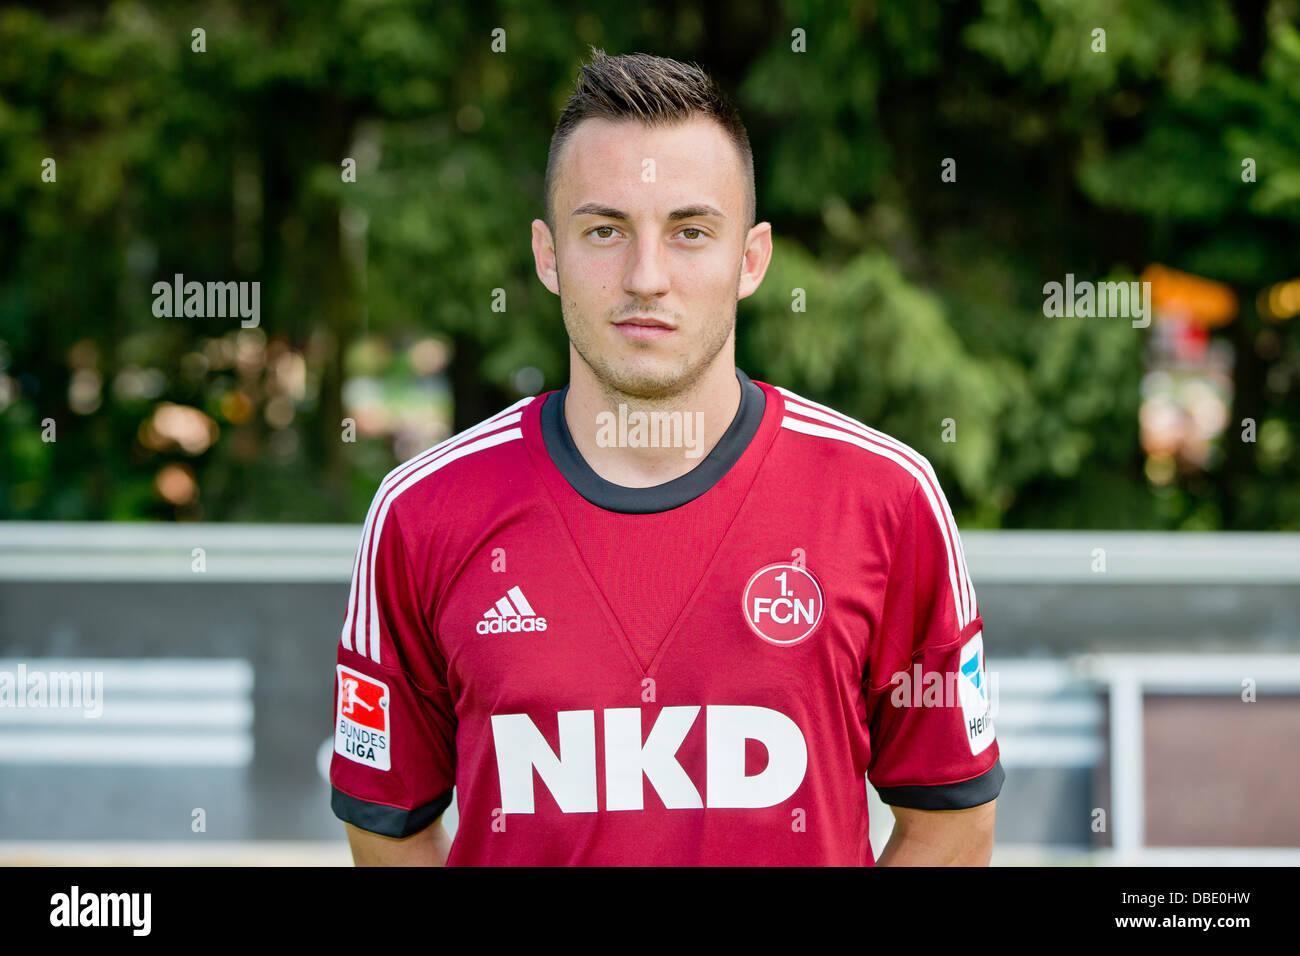 Player Josip Drmic of German Bundesliga club 1. FC Nurnberg during the official photocall for the season 2013-14 - Stock Image